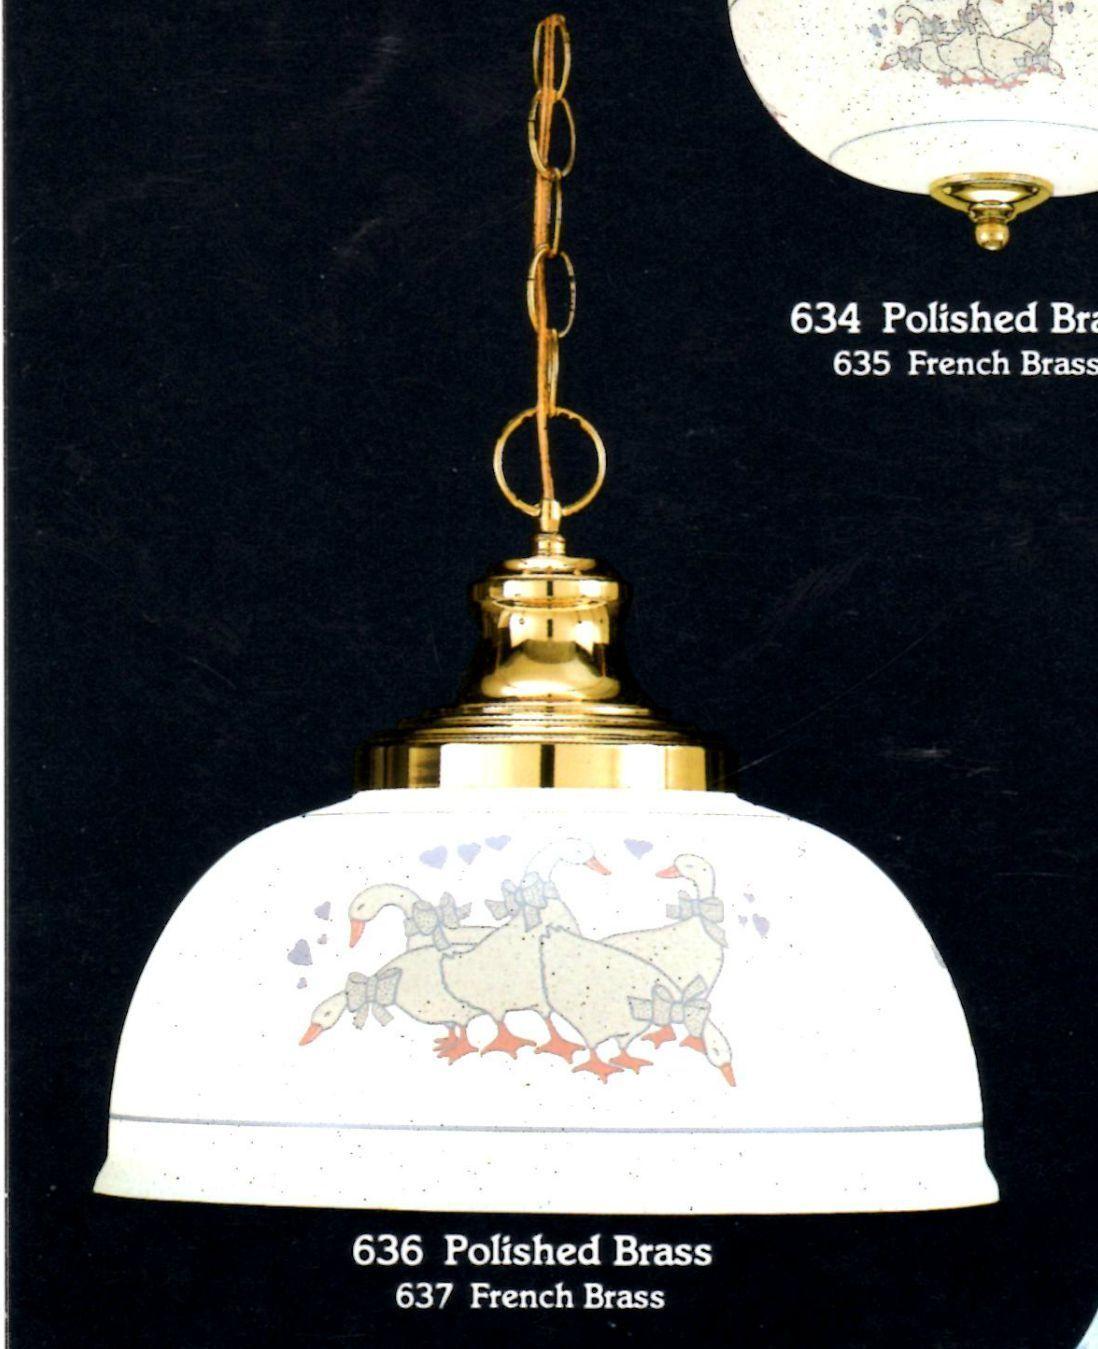 COUNTRY 1-Light Weiß Duck Design PENDANT Ceiling FIXTURE NEW  636